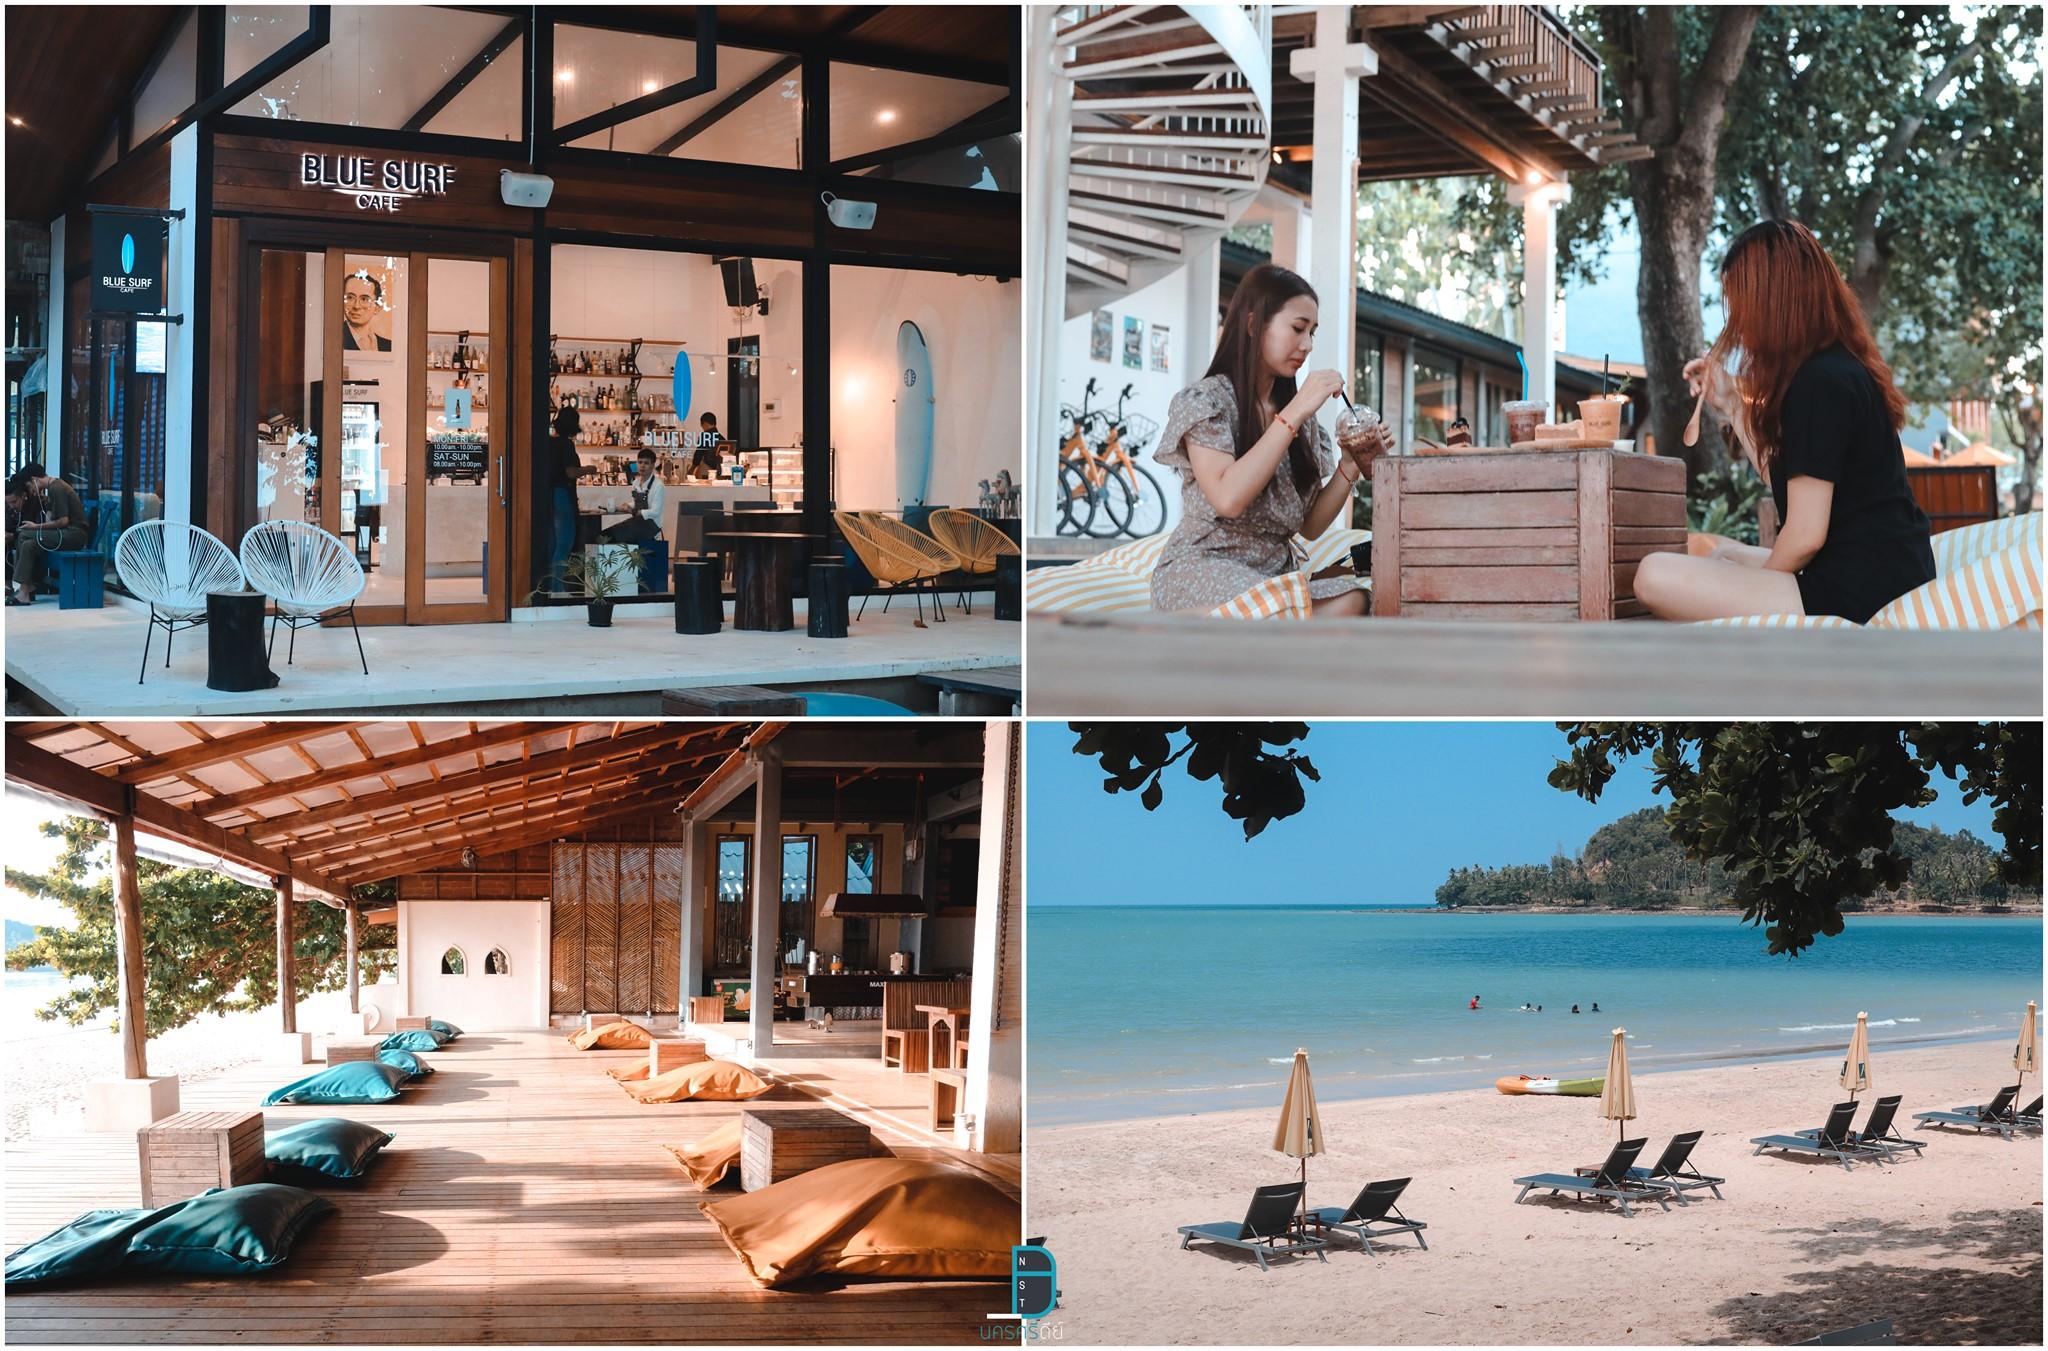 2.-Blue-surf-Cafe คลิกที่นี่ คาเฟ่,Cafe,นครศรีธรรมราช,2021,2564,ของกิน,จุดเช็คอิน,จุดถ่ายรูป